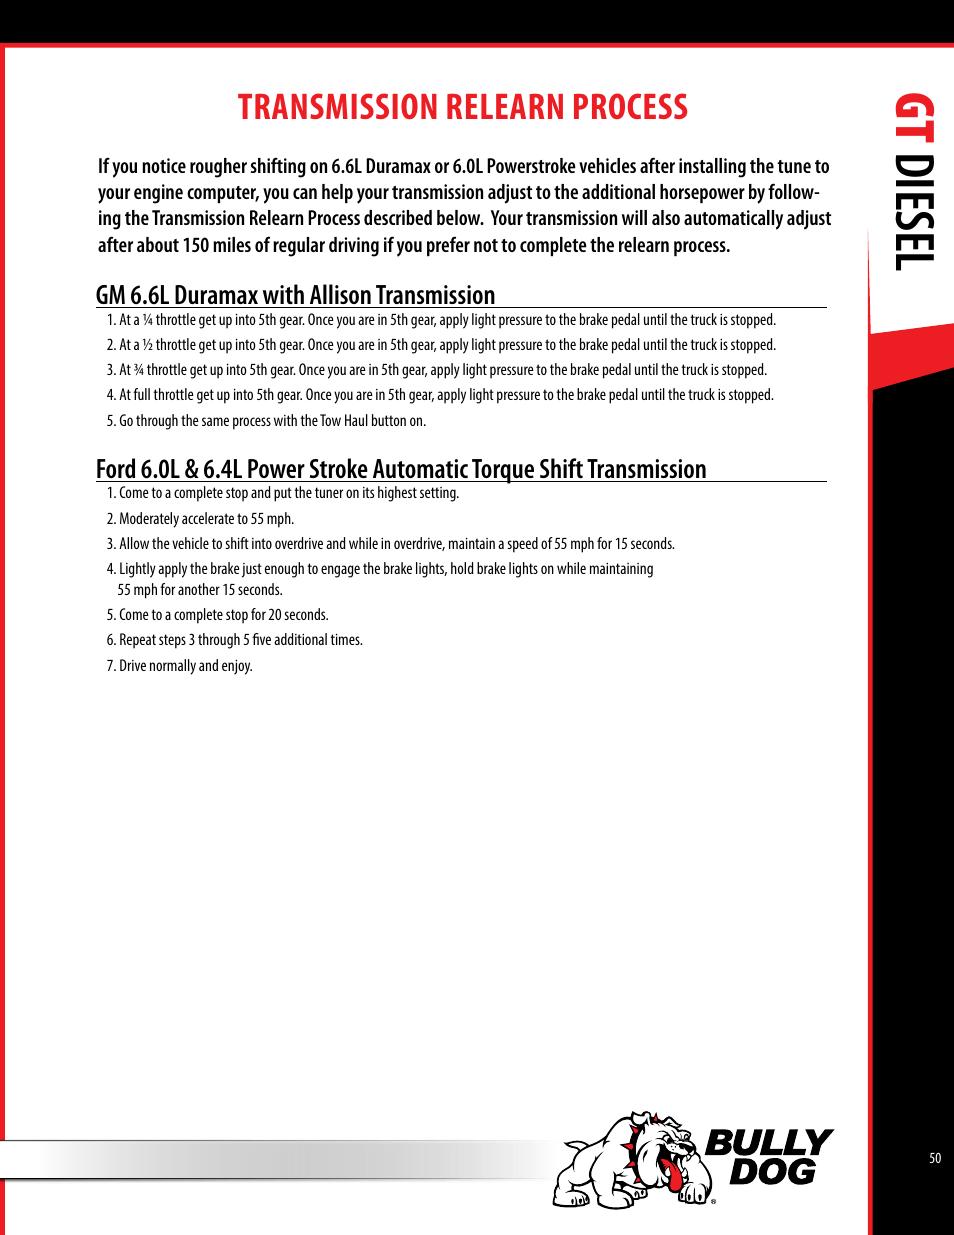 Duramax transmission user manuals array gt diesel transmission relearn process bully dog 40420 gauge gt rh manualsdir com fandeluxe Image collections